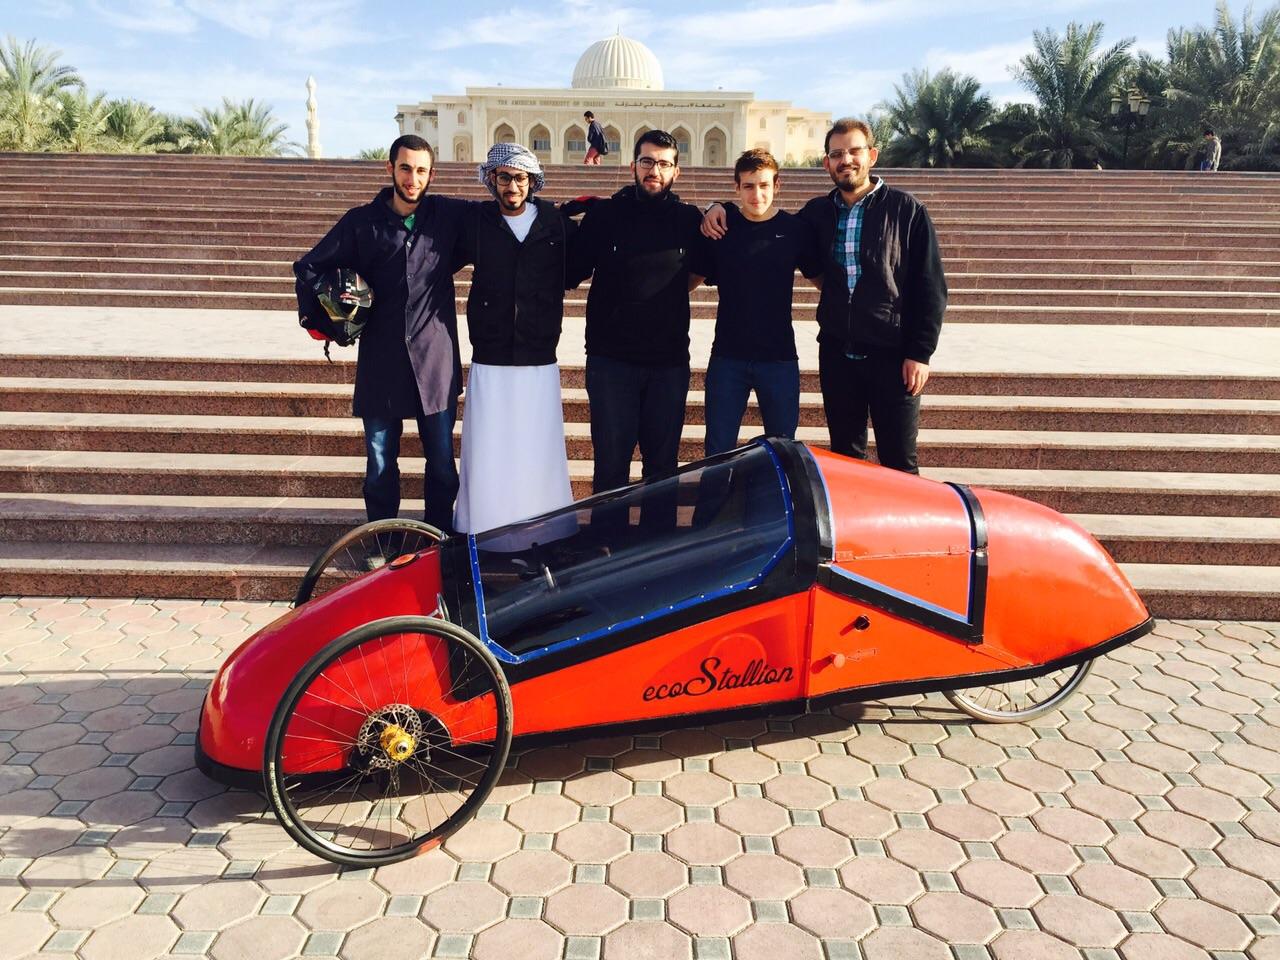 American_University_of_Sharjah-143